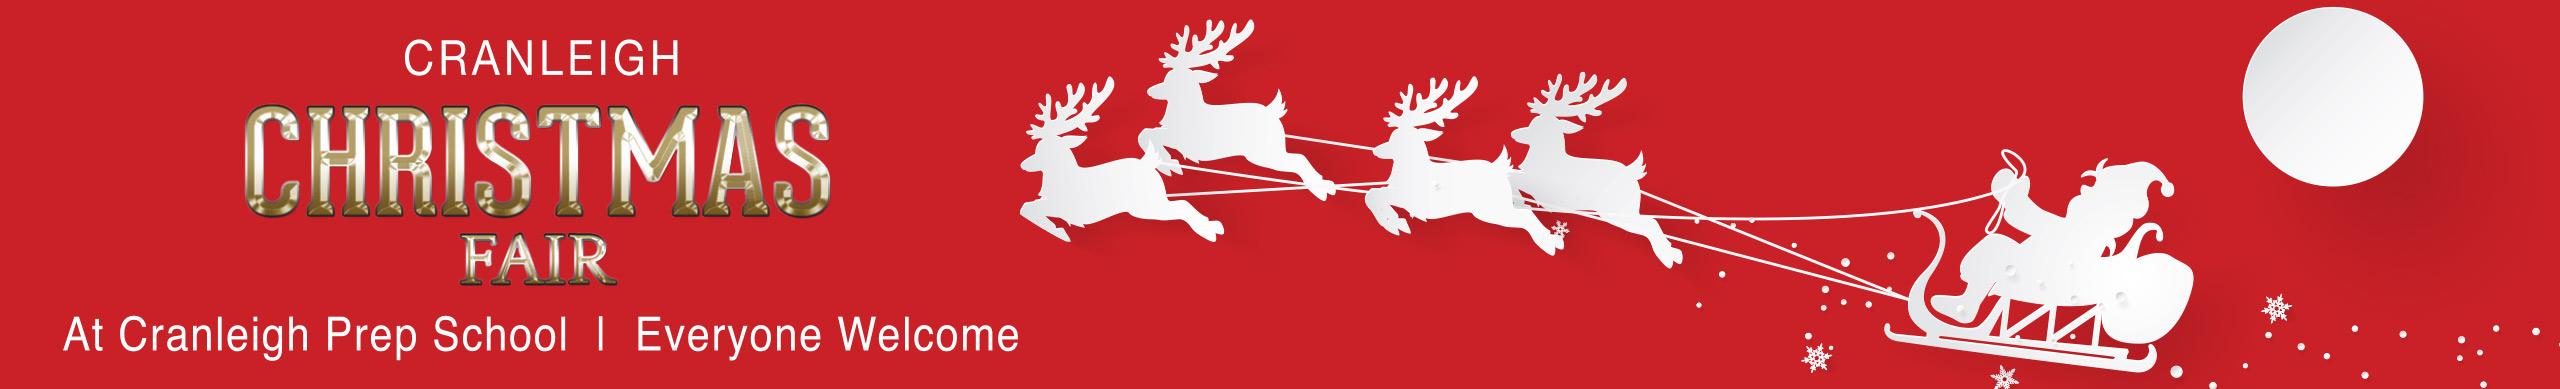 Cranleigh Christmas Fair 2020